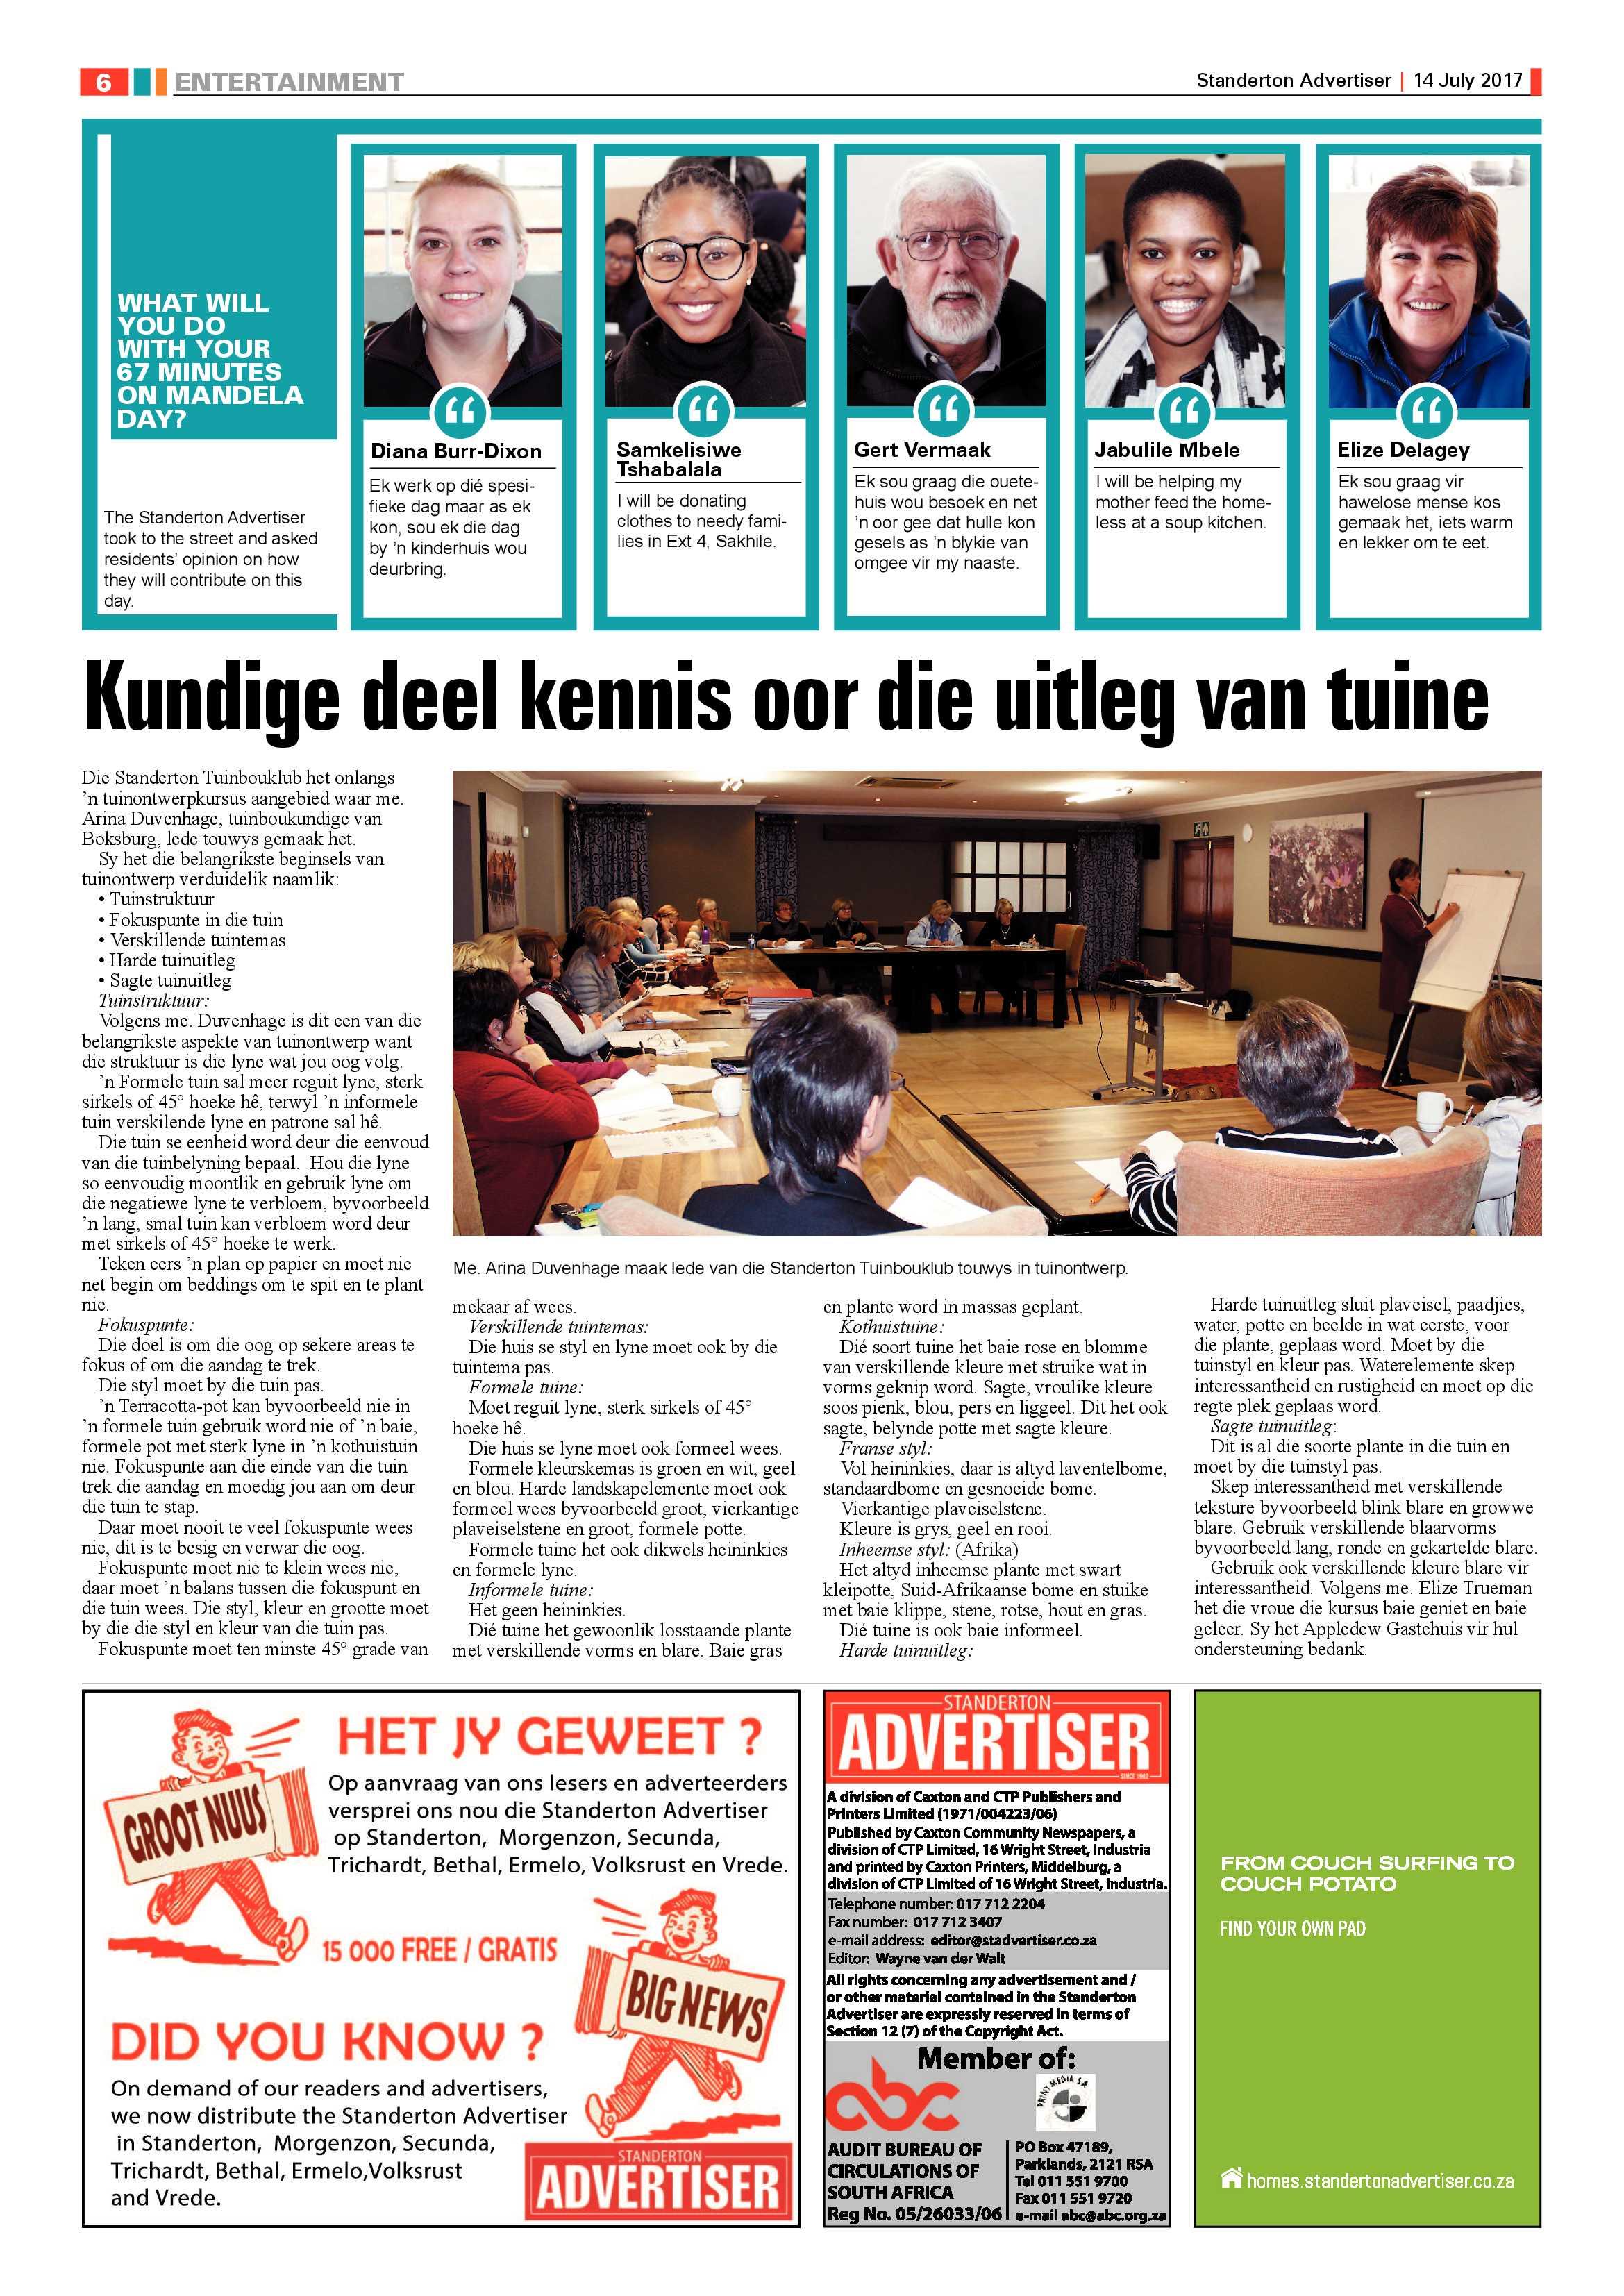 standerton-advertiser-14-july-2017-epapers-page-6